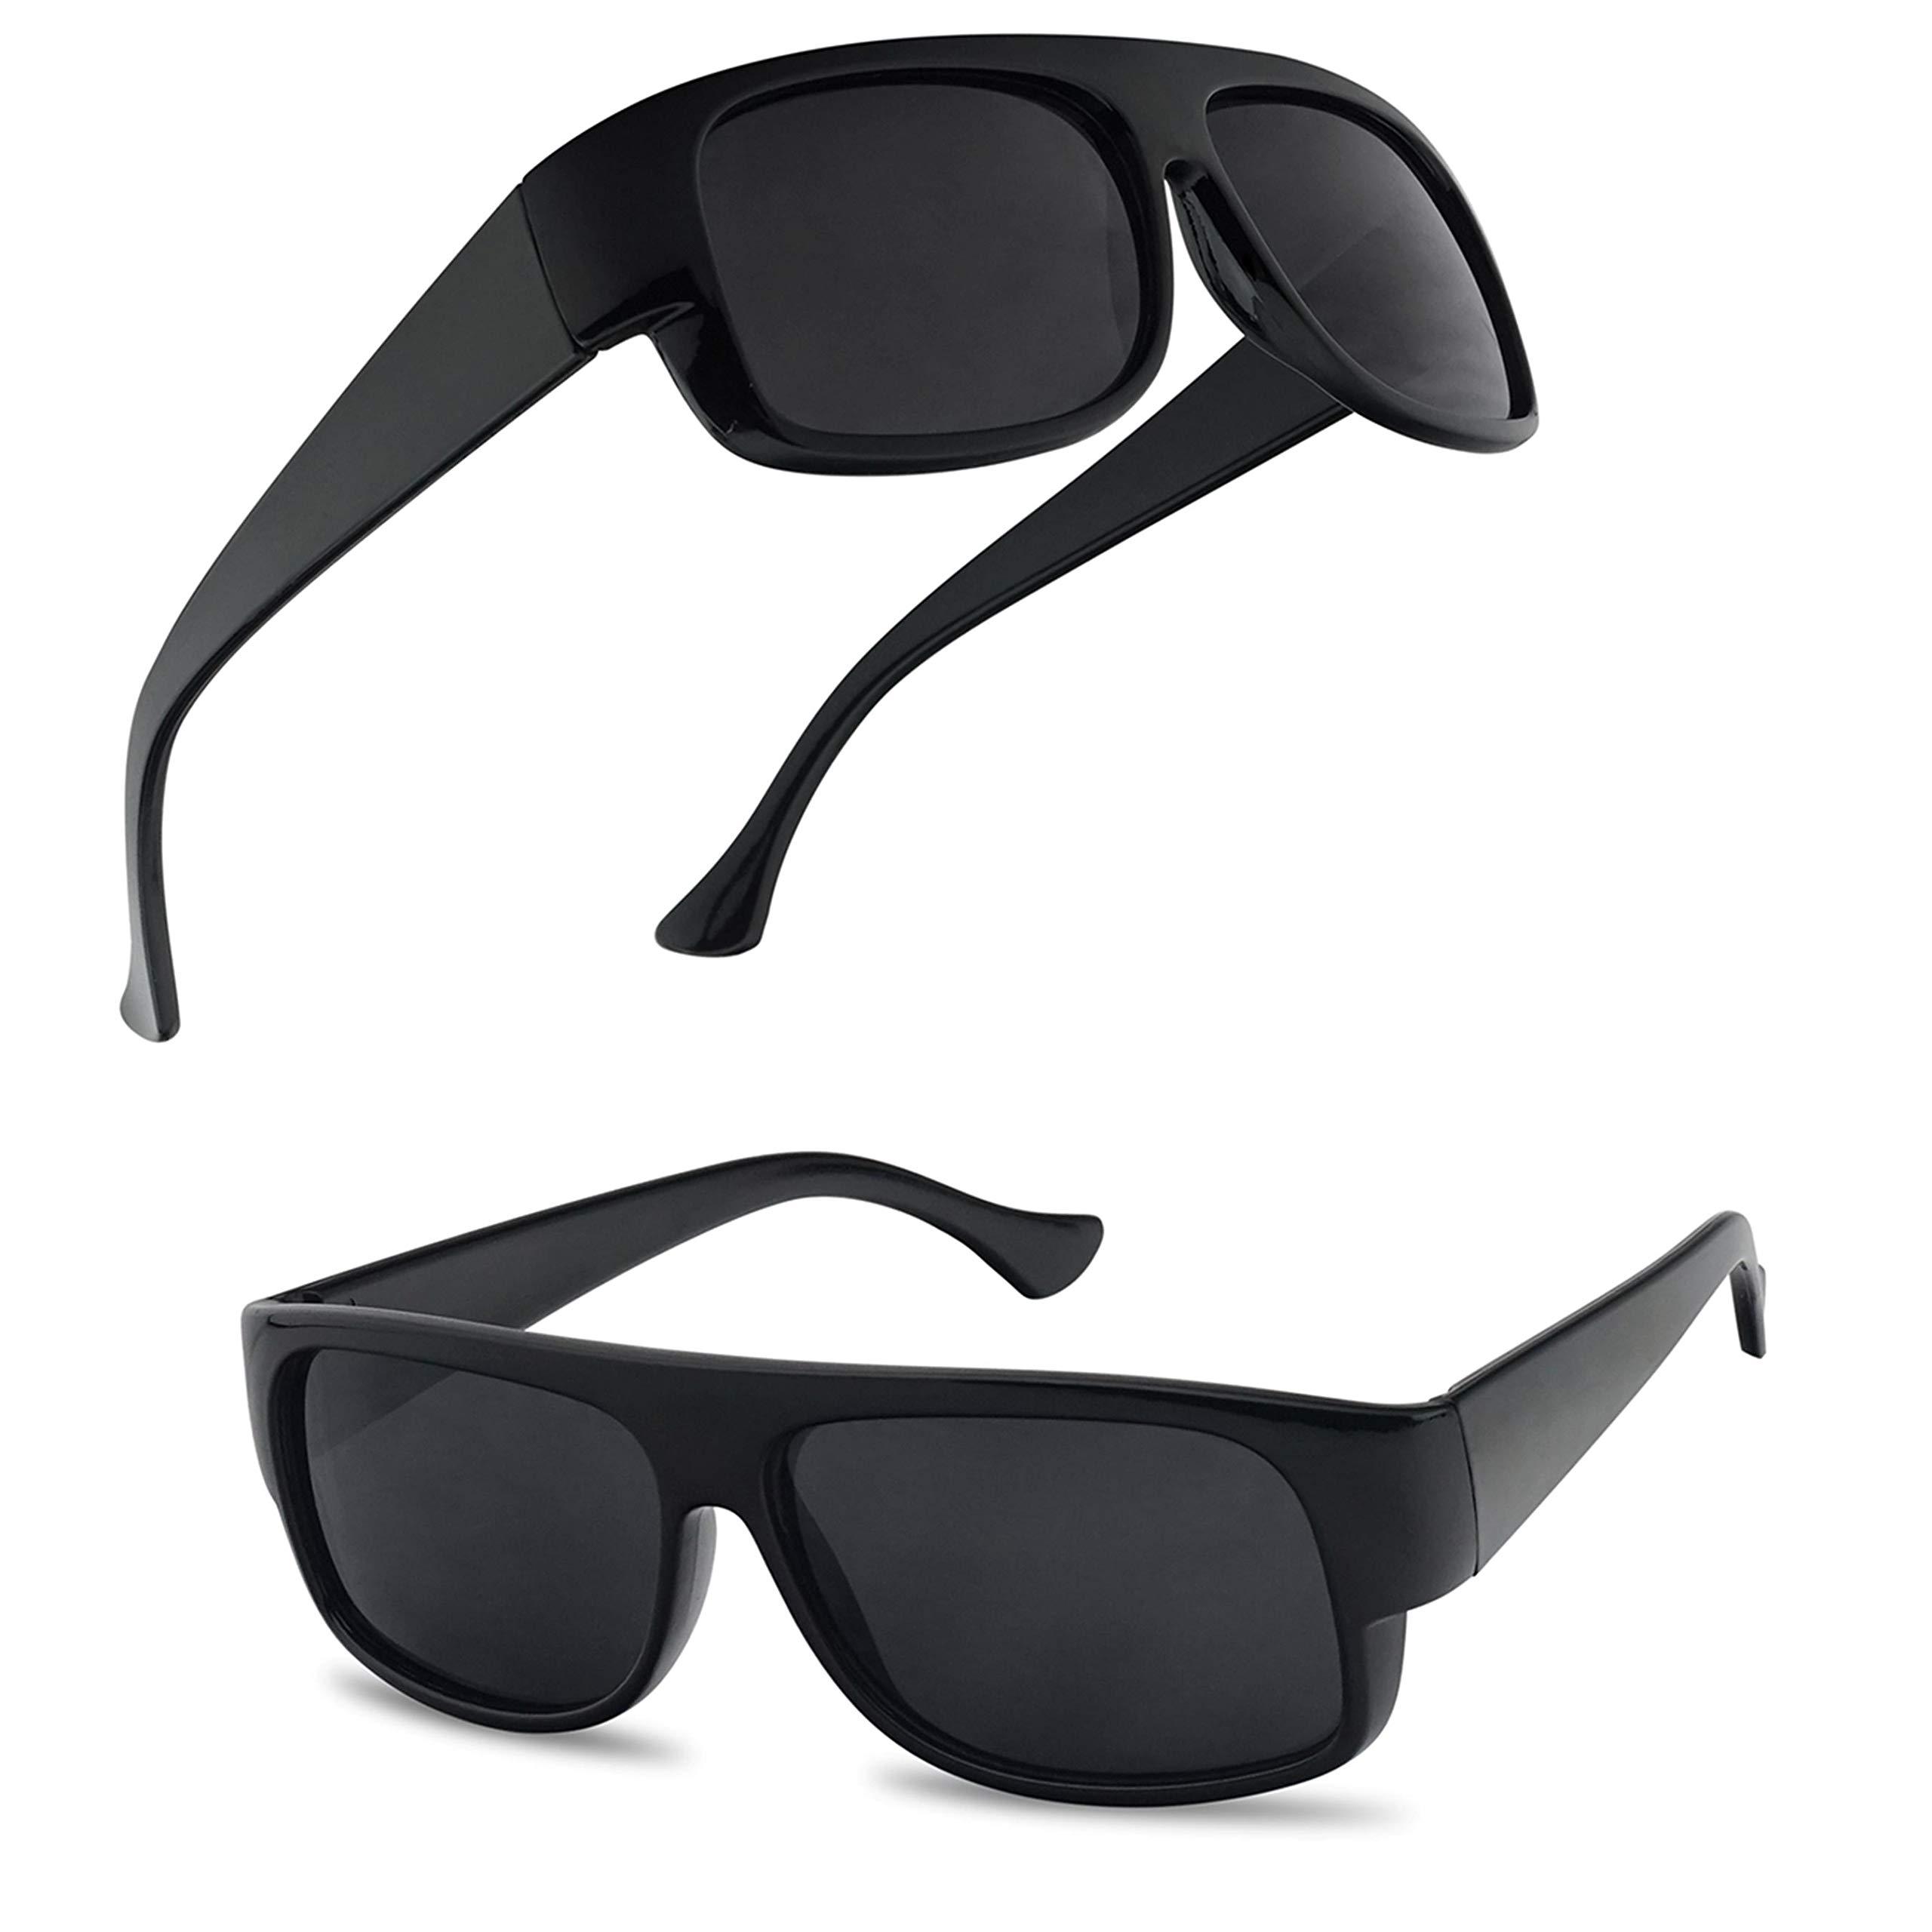 SunglassUP Classic Old School Eazy E Square Flat Top OG Loc Sunglasses (2-Pack Black) by SunglassUP